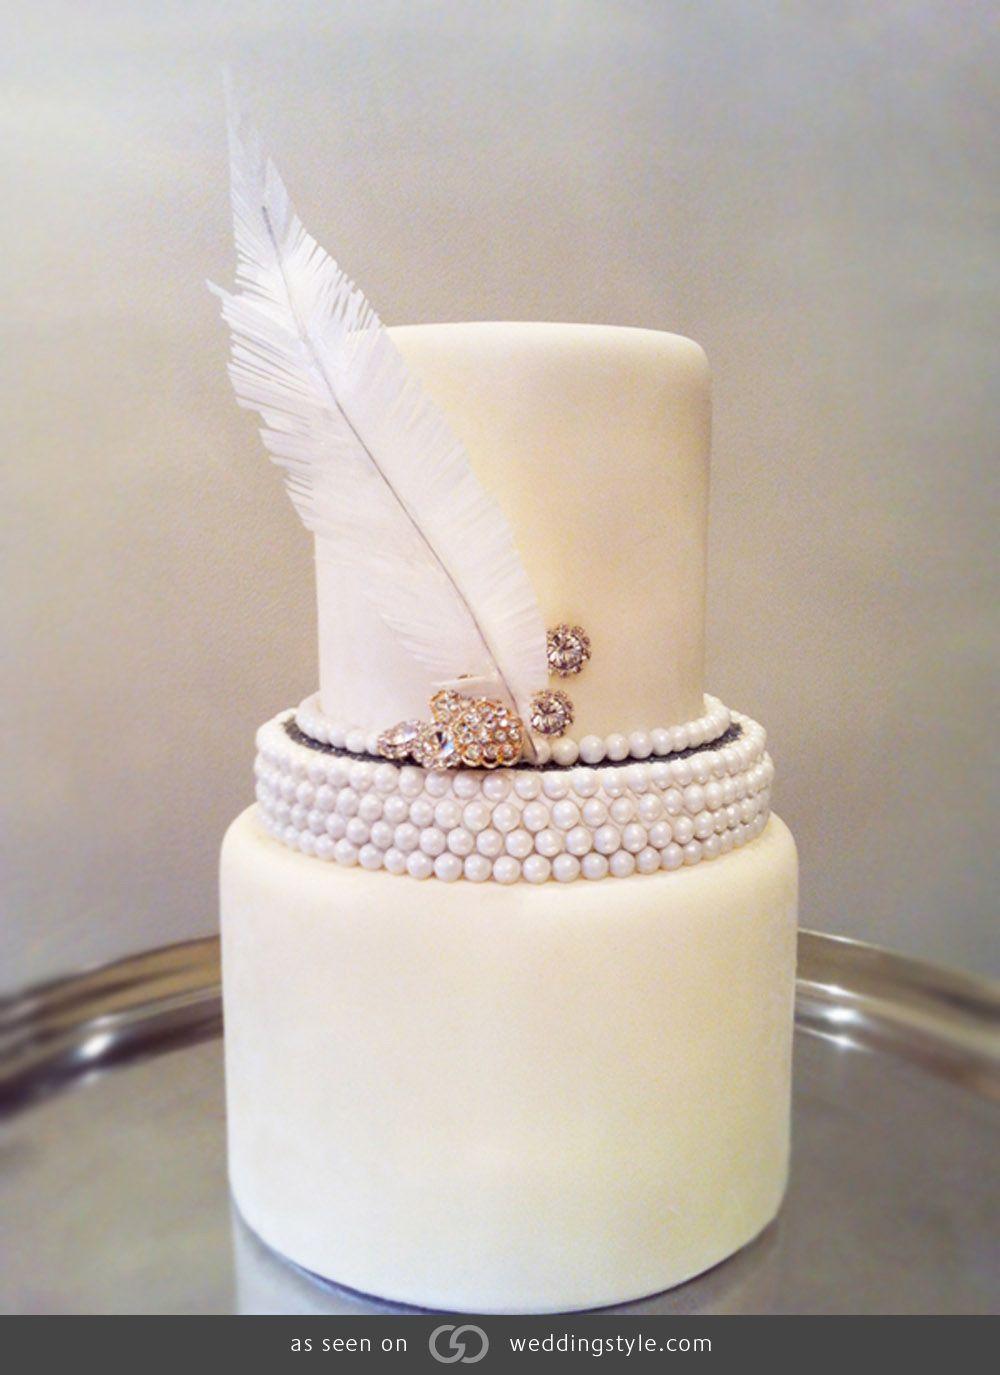 Small Sweet Wedding Cakes Wedding Photos Luxury Planning